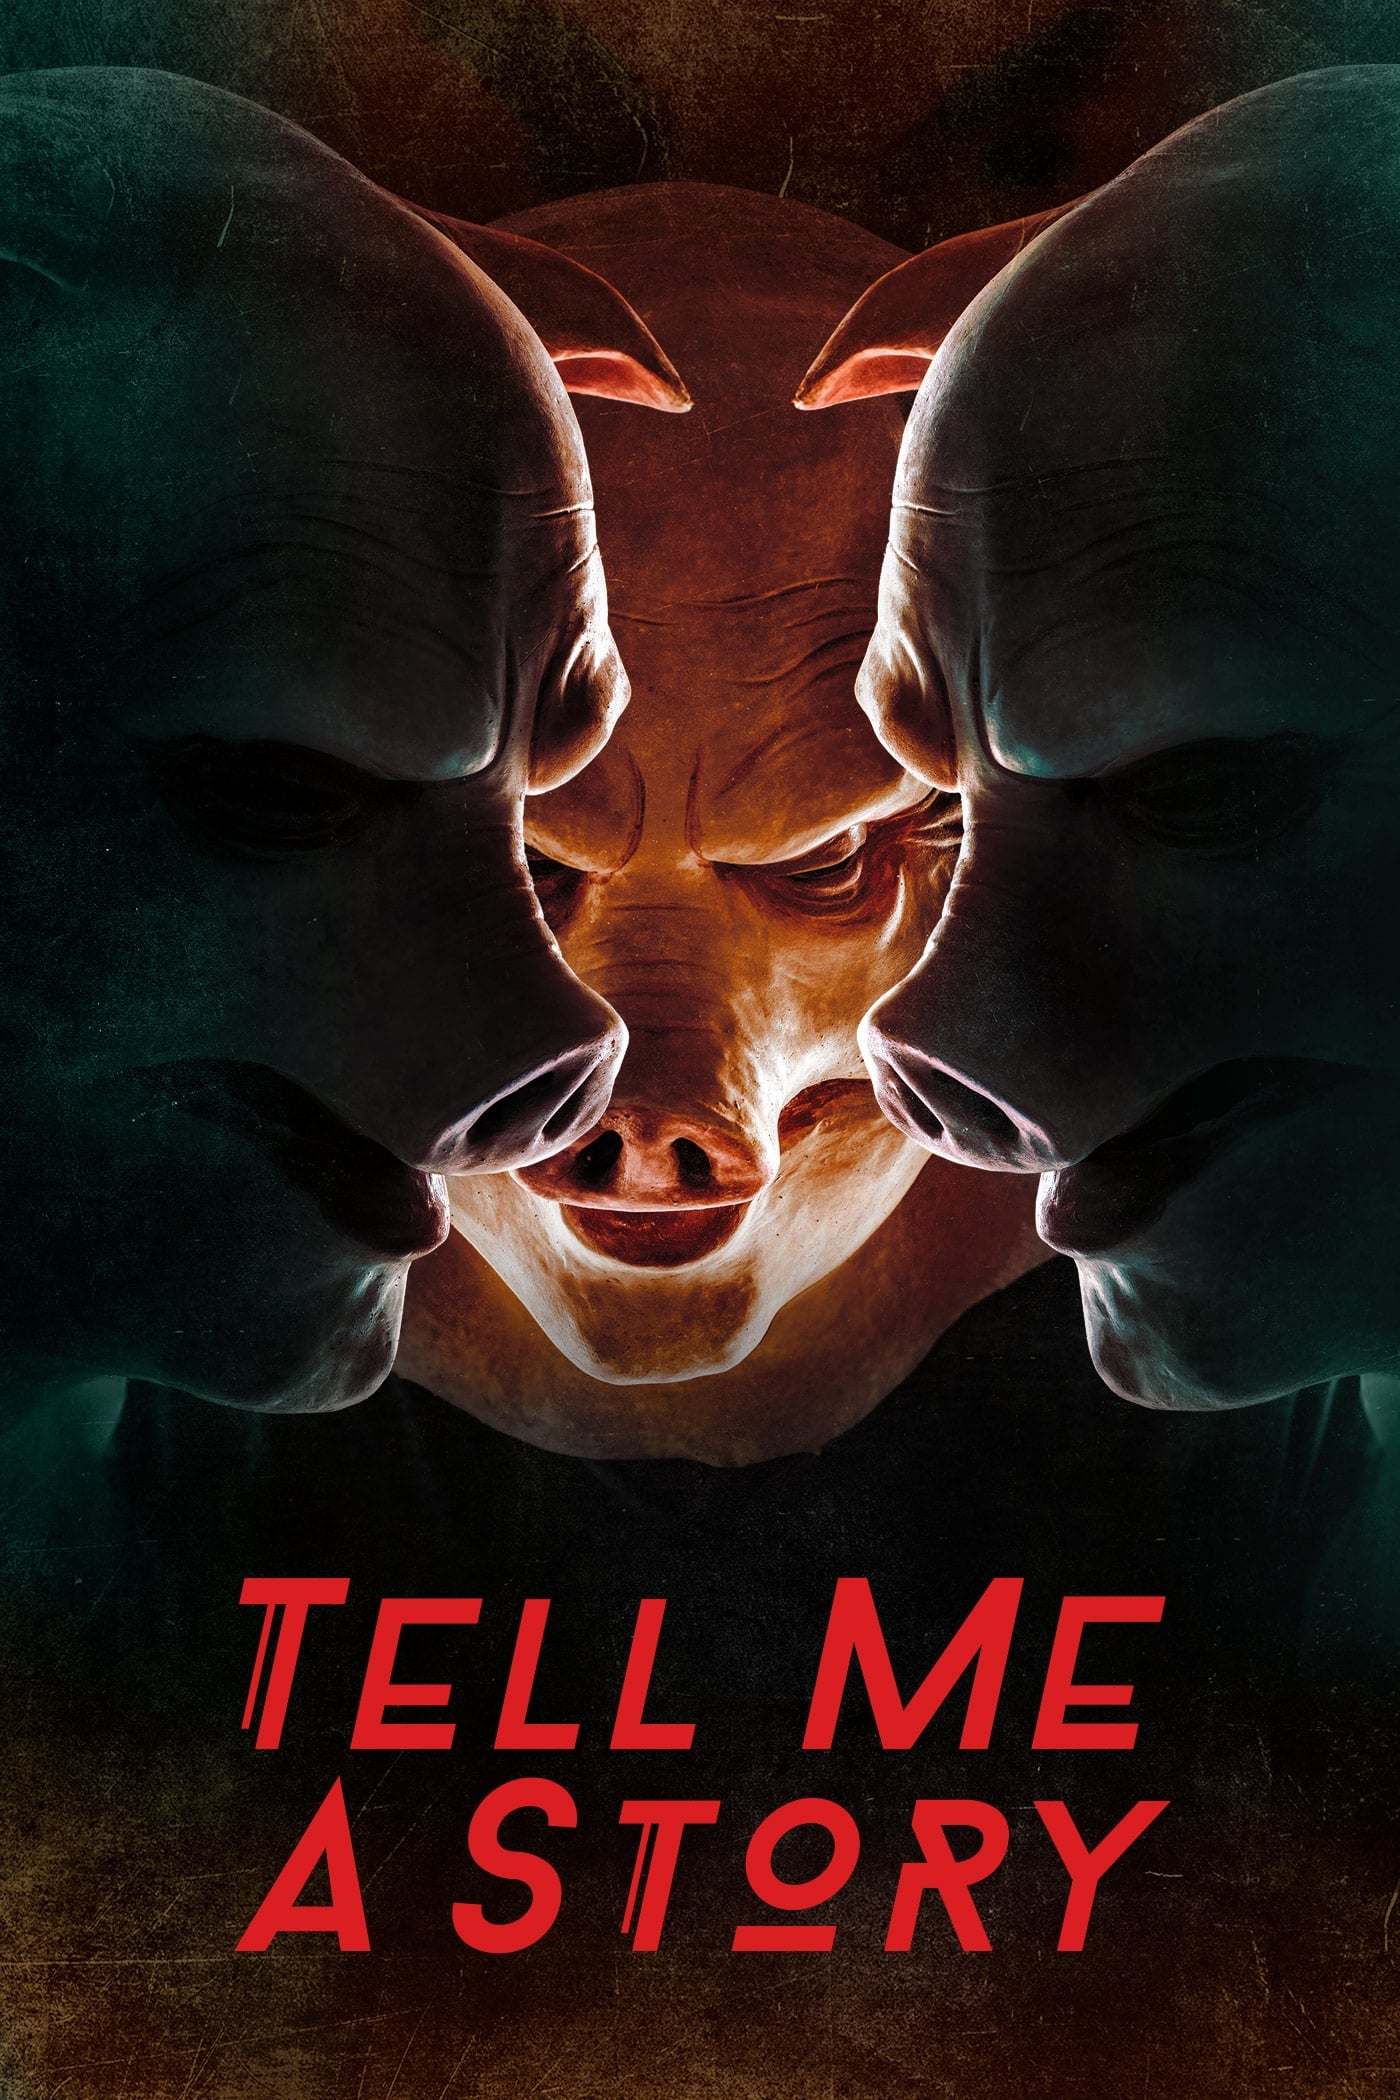 Tell Me a Story Season 1